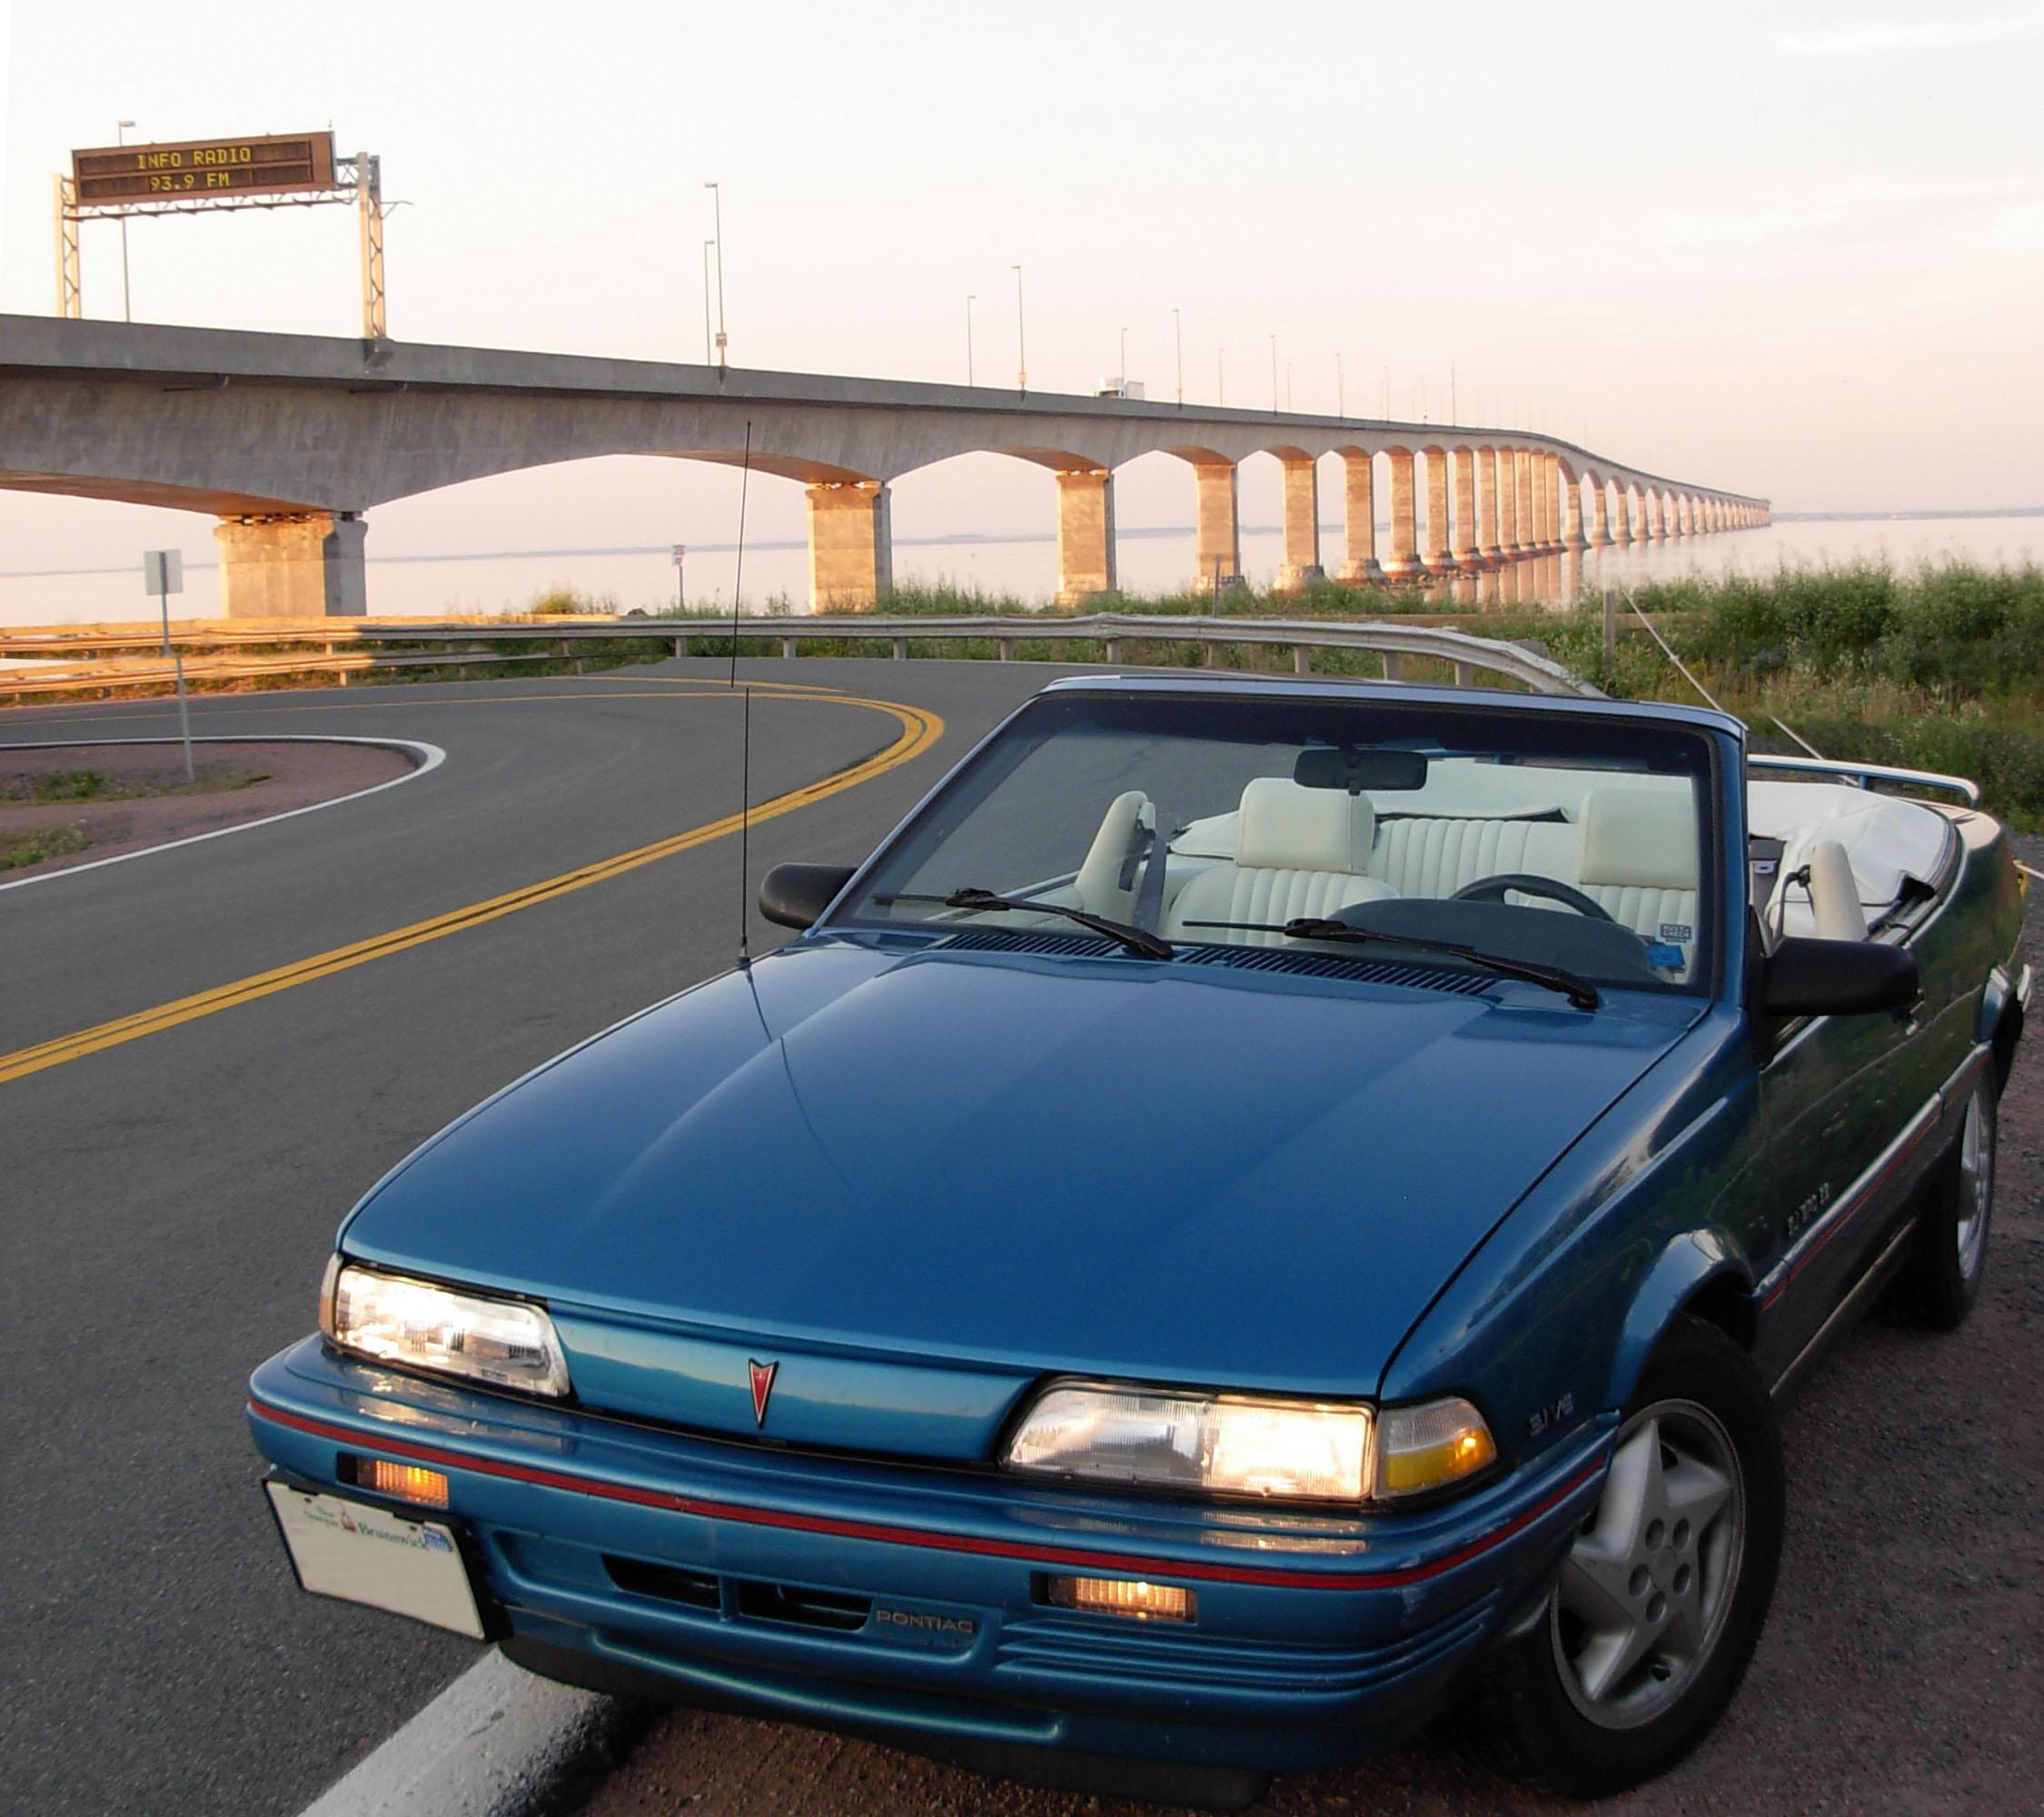 Pontiac Sunbird Convertible At Confederation Bridge